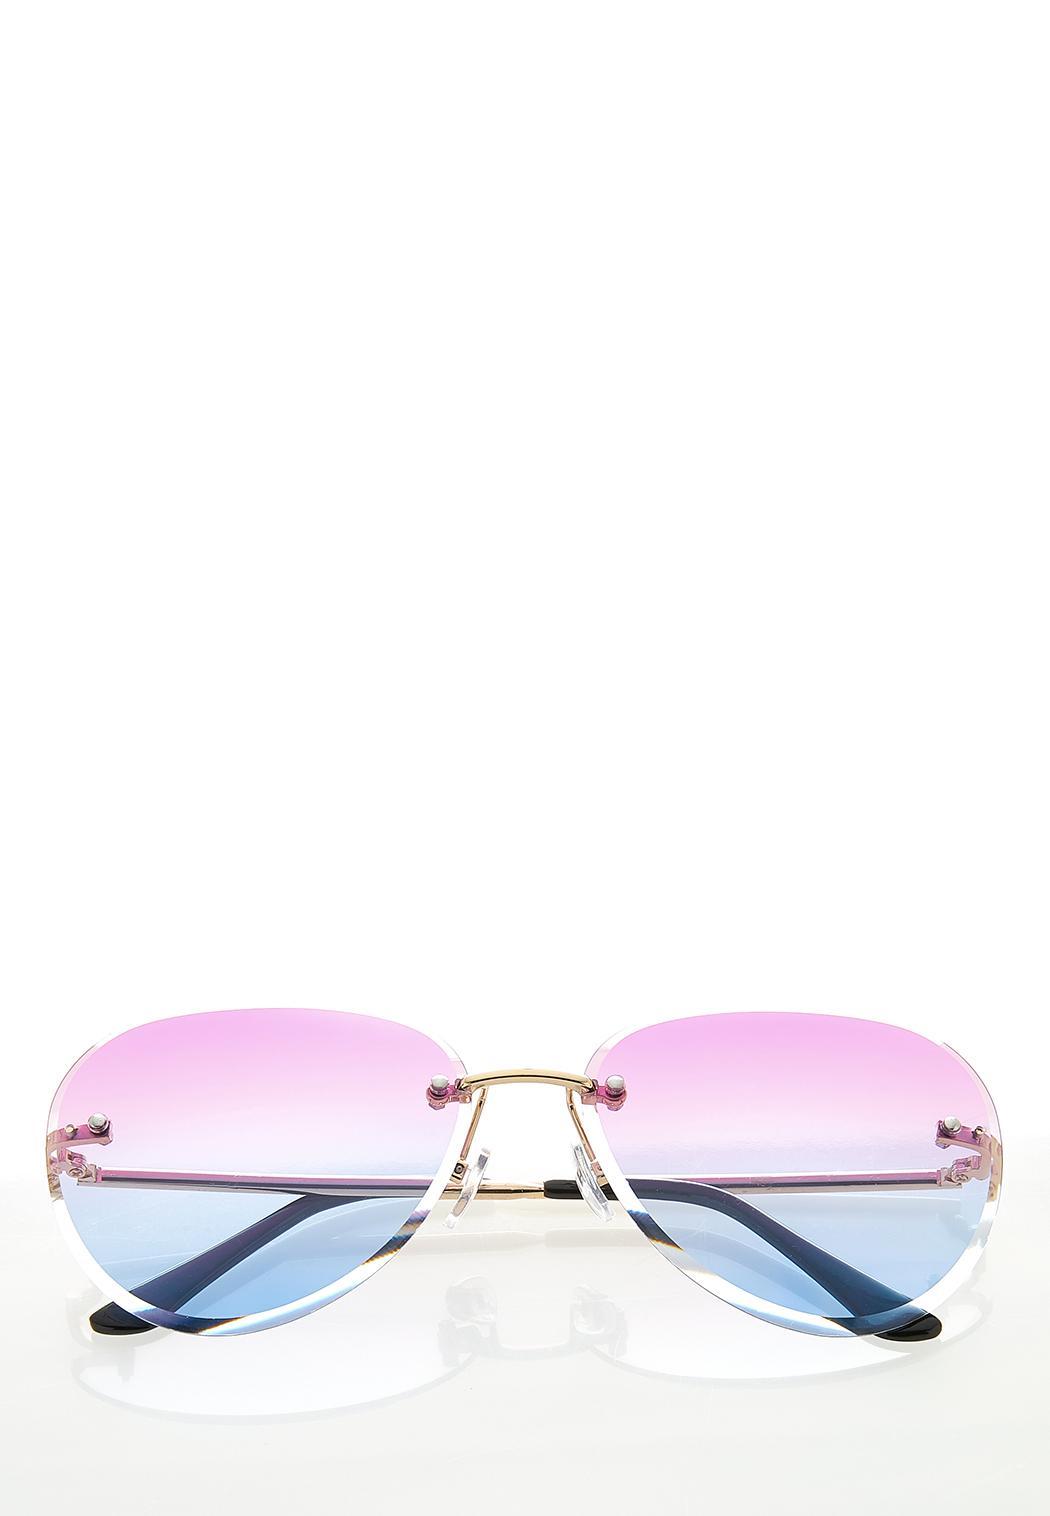 Sunset Skies Beveled Sunglasses